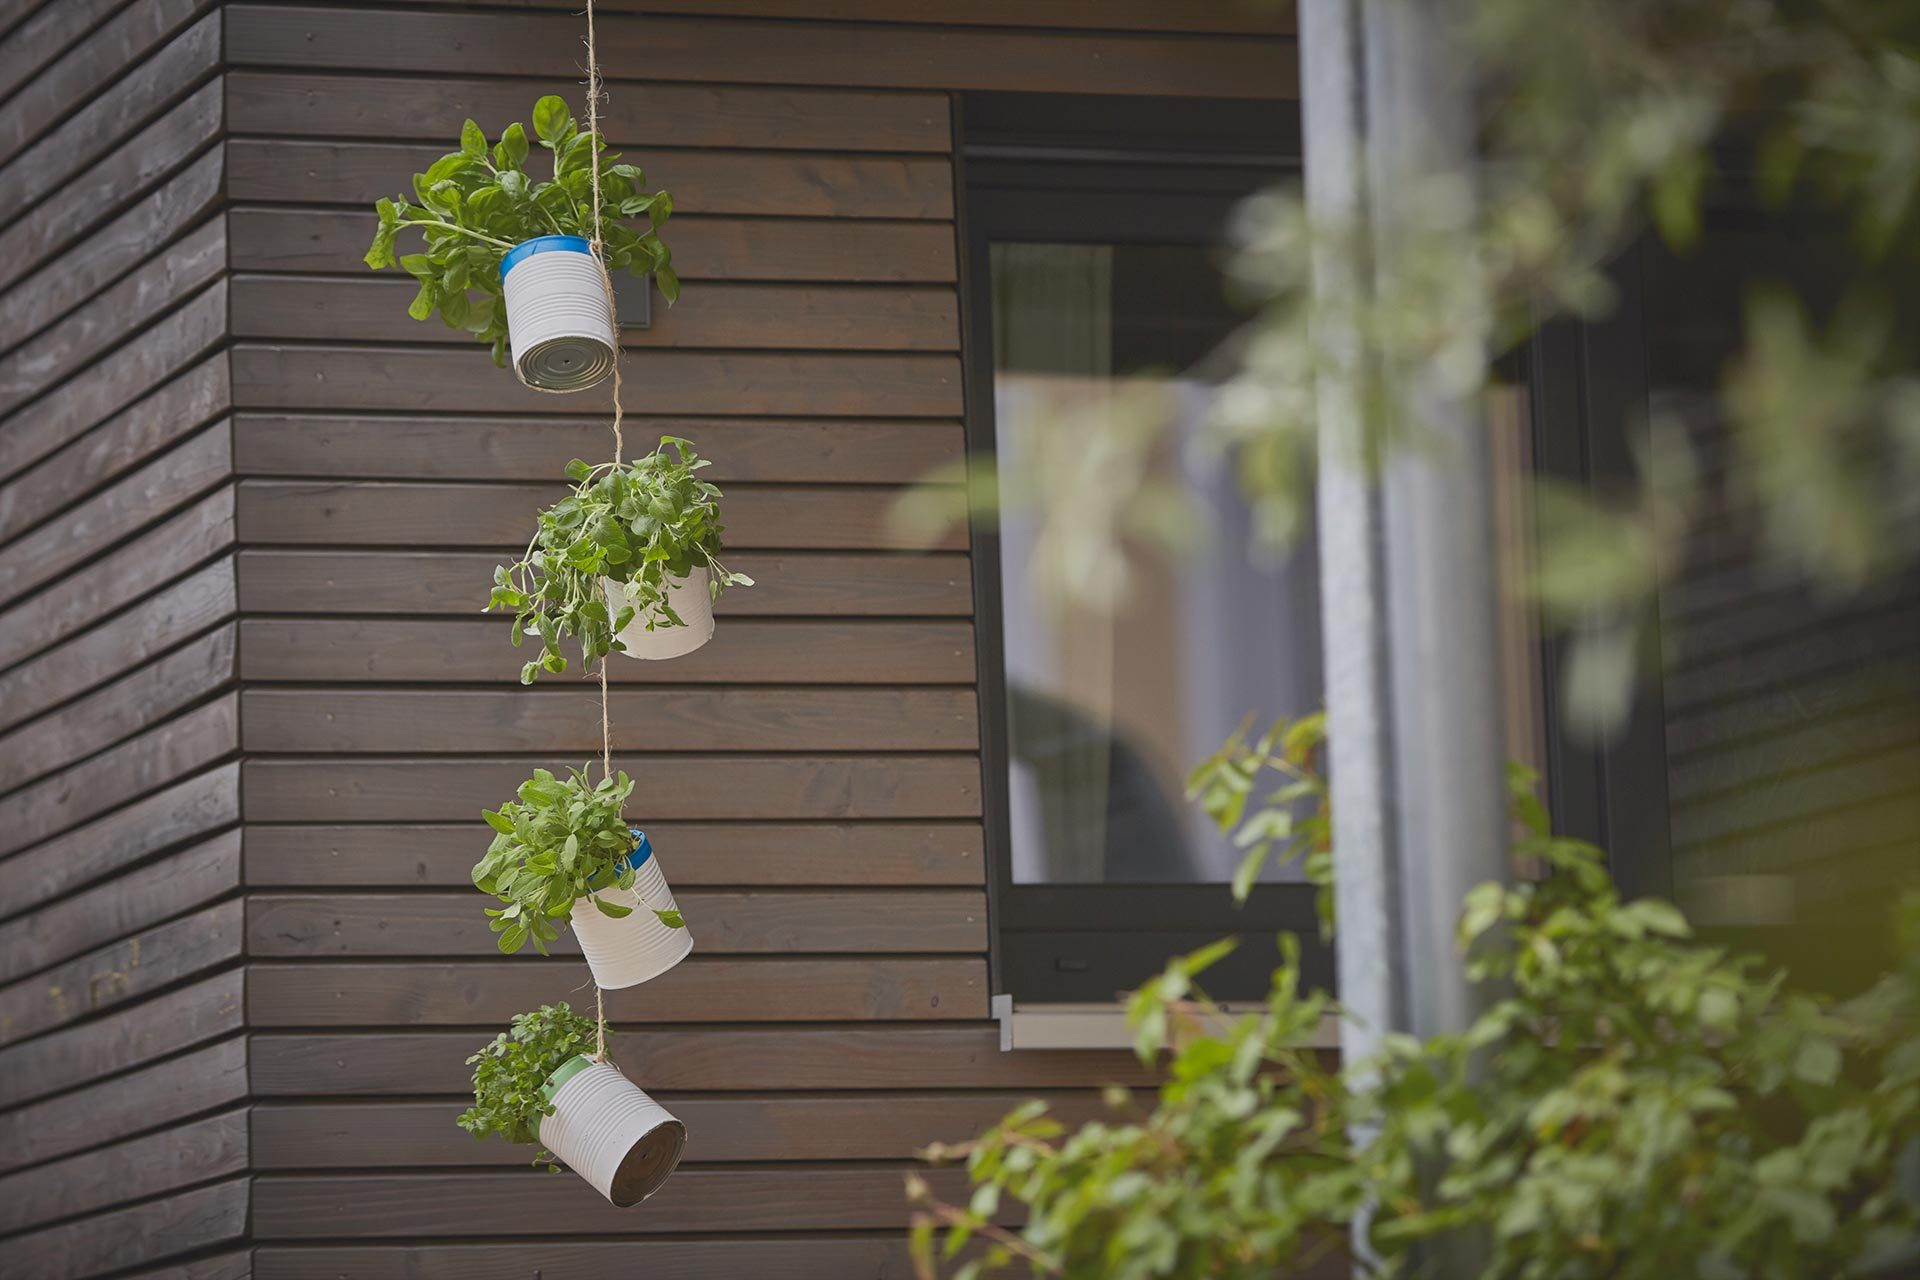 Upcycling Ideen Holz Inspirierende Bastel Und Upcycling